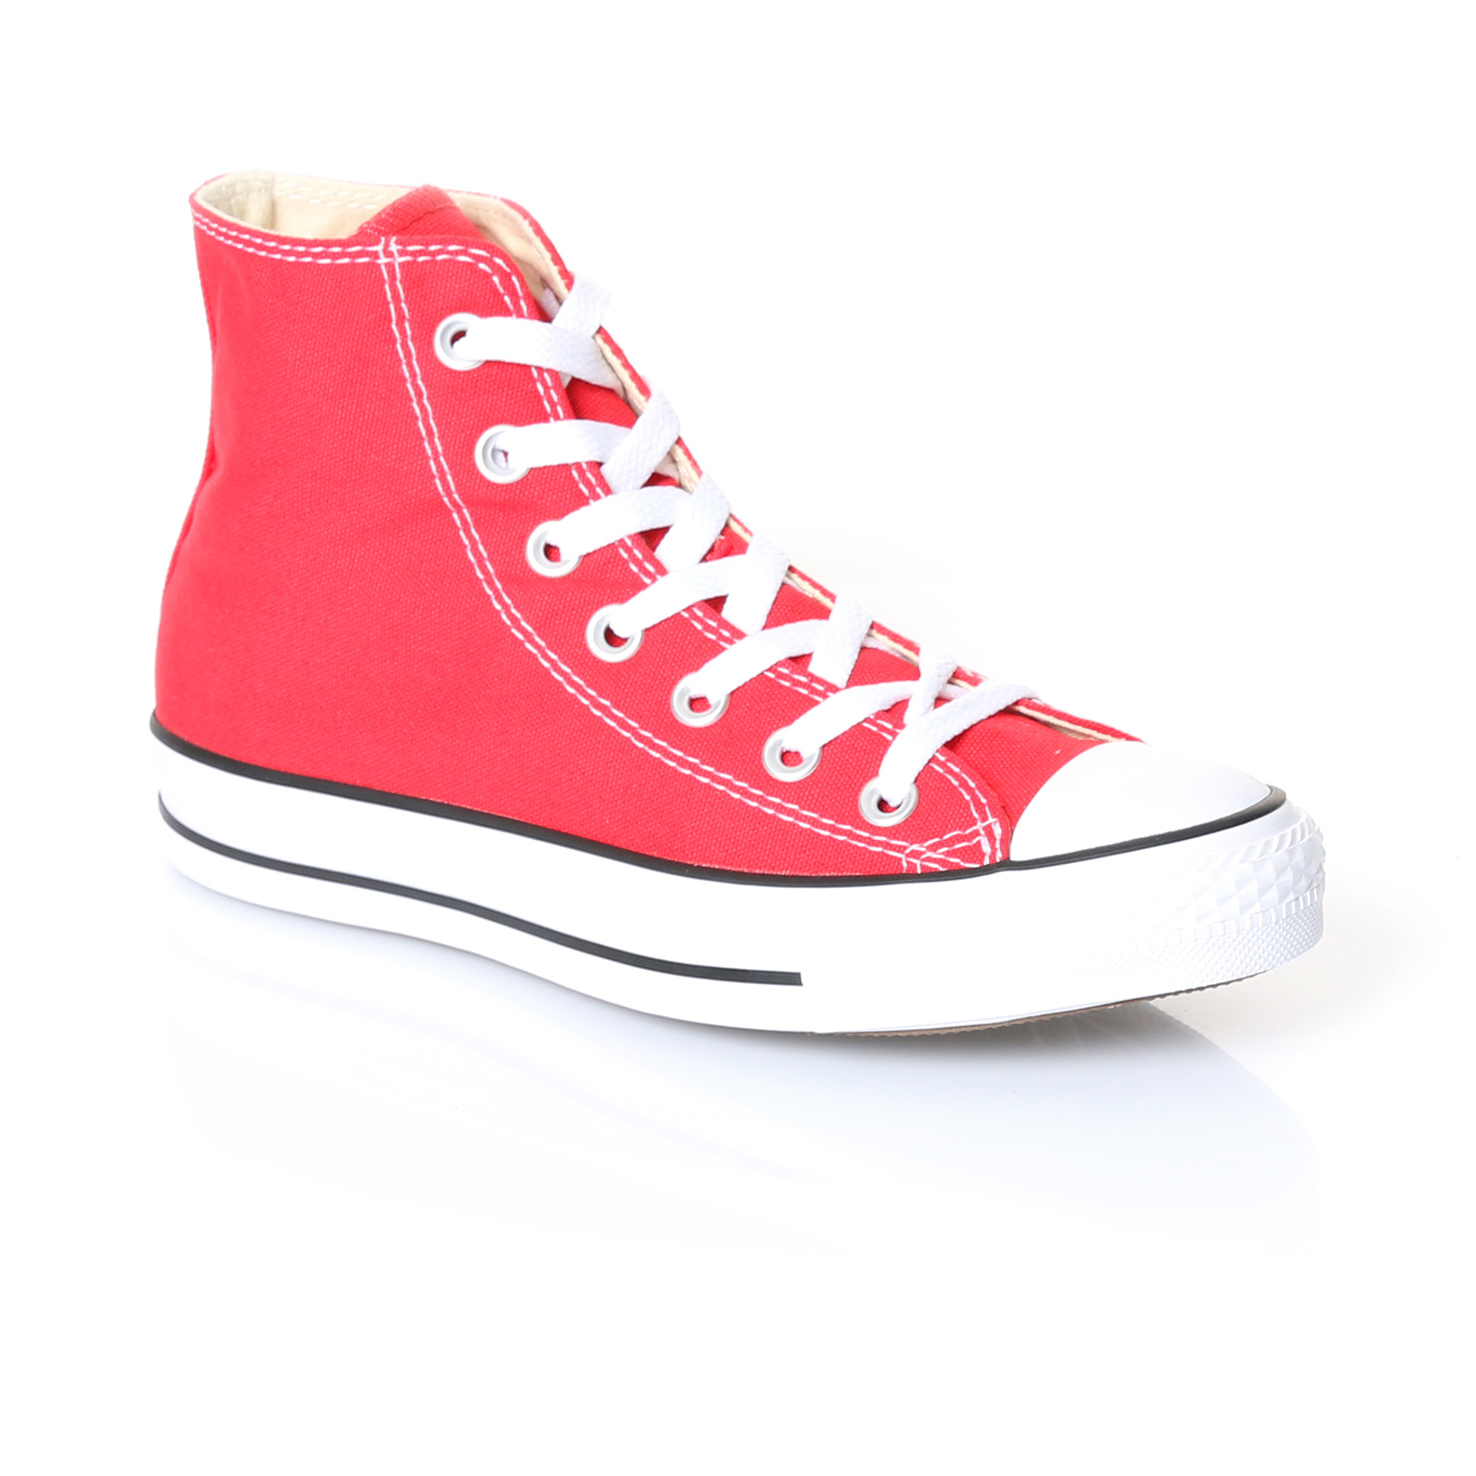 daa5cce818ef9 Converse Chuck Taylor All Star Mid Unisex Kırmızı Sneaker.M9621C.600